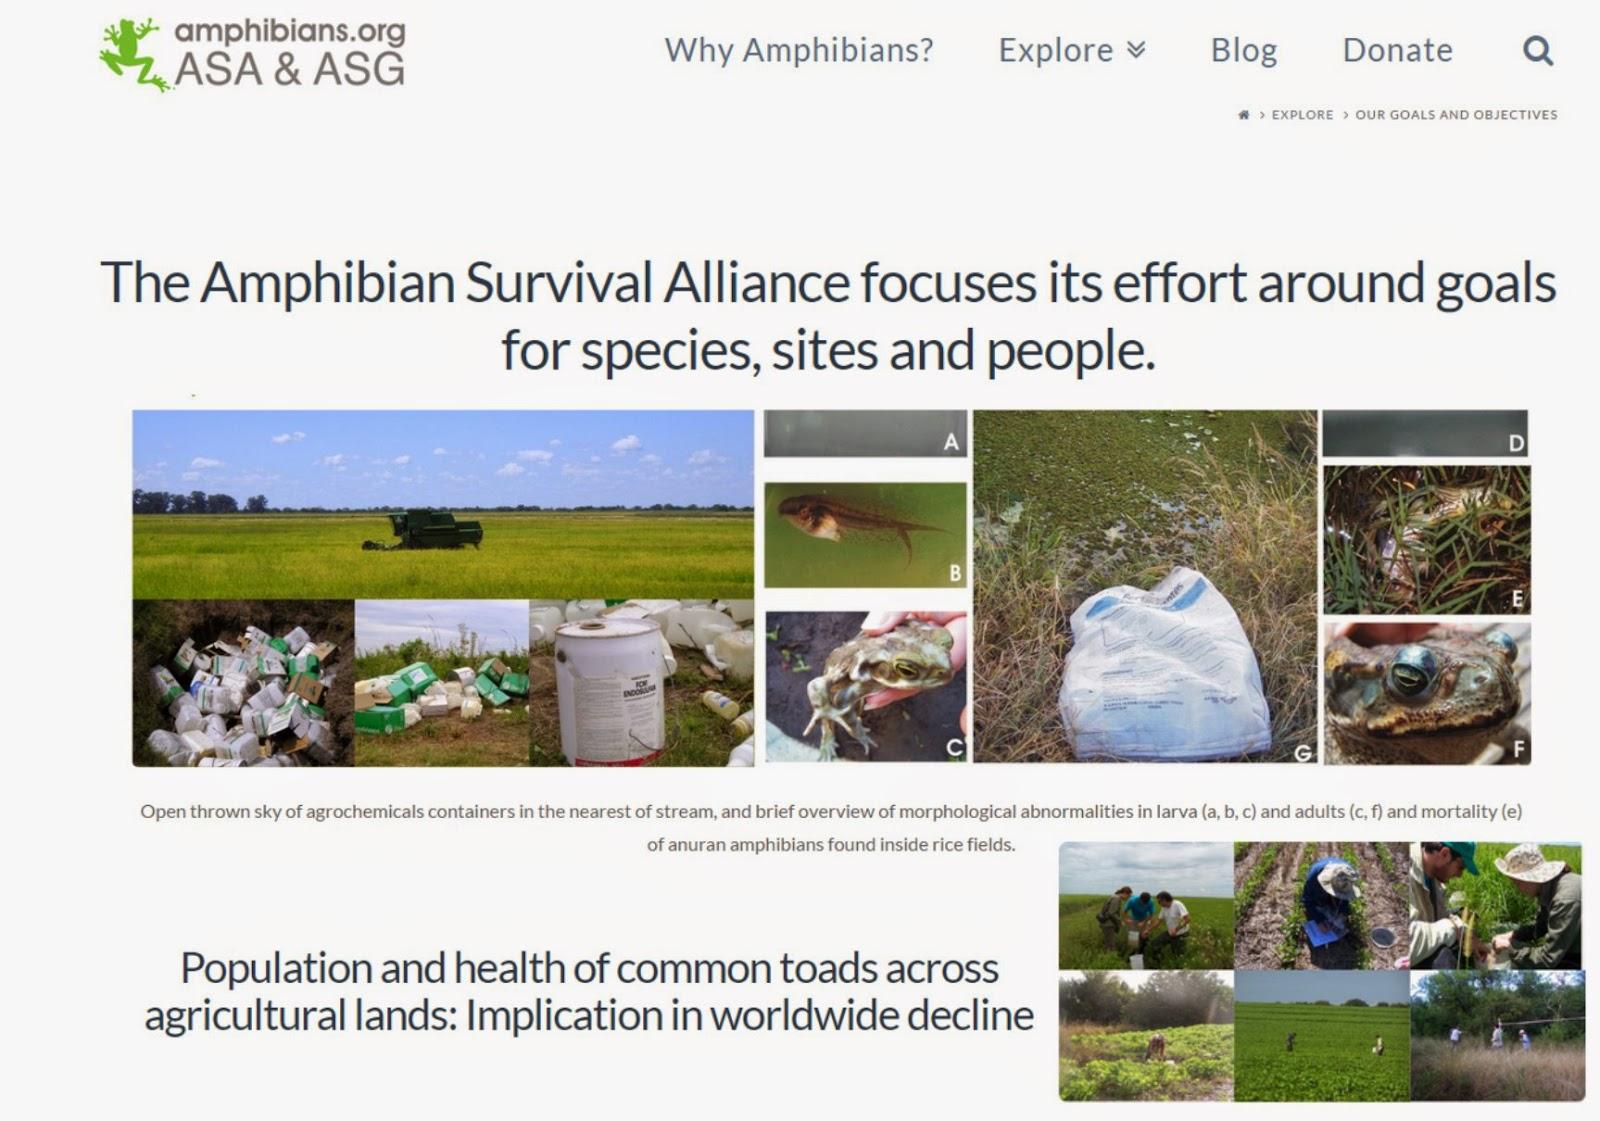 http://www.amphibians.org/seedgrants/2005peltzer/